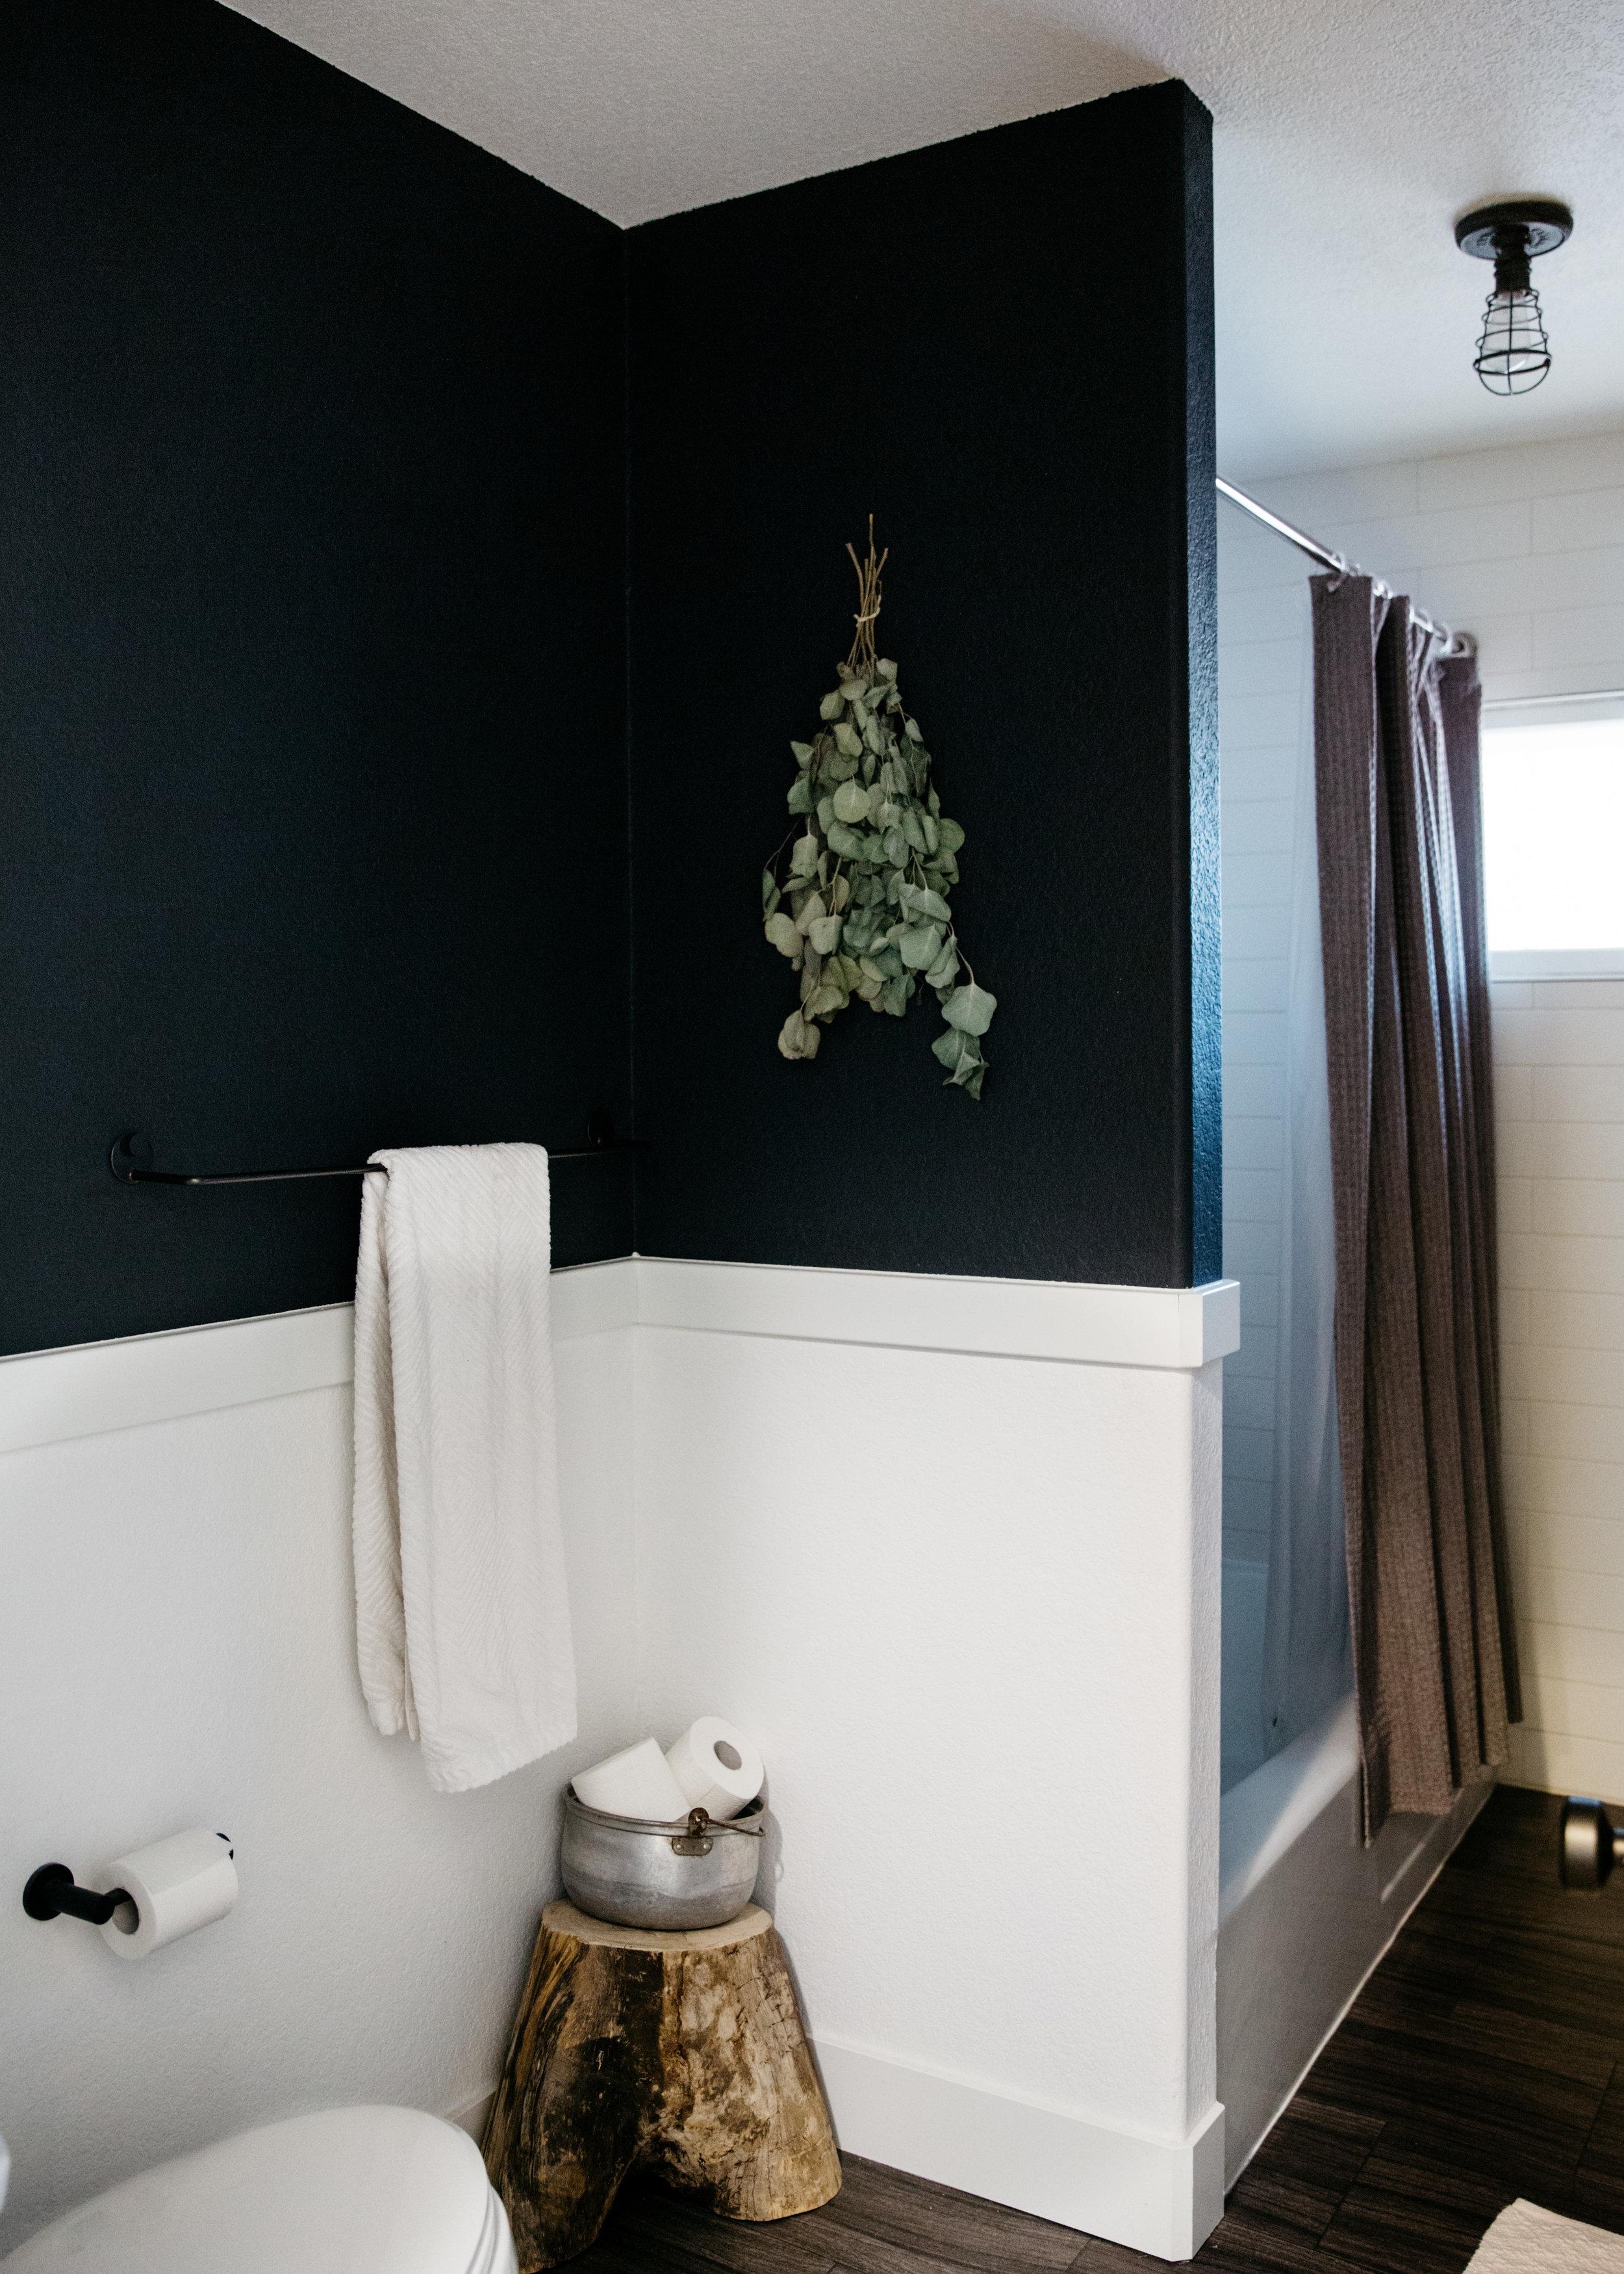 mitchell-guest-bathroom-after-2.jpg